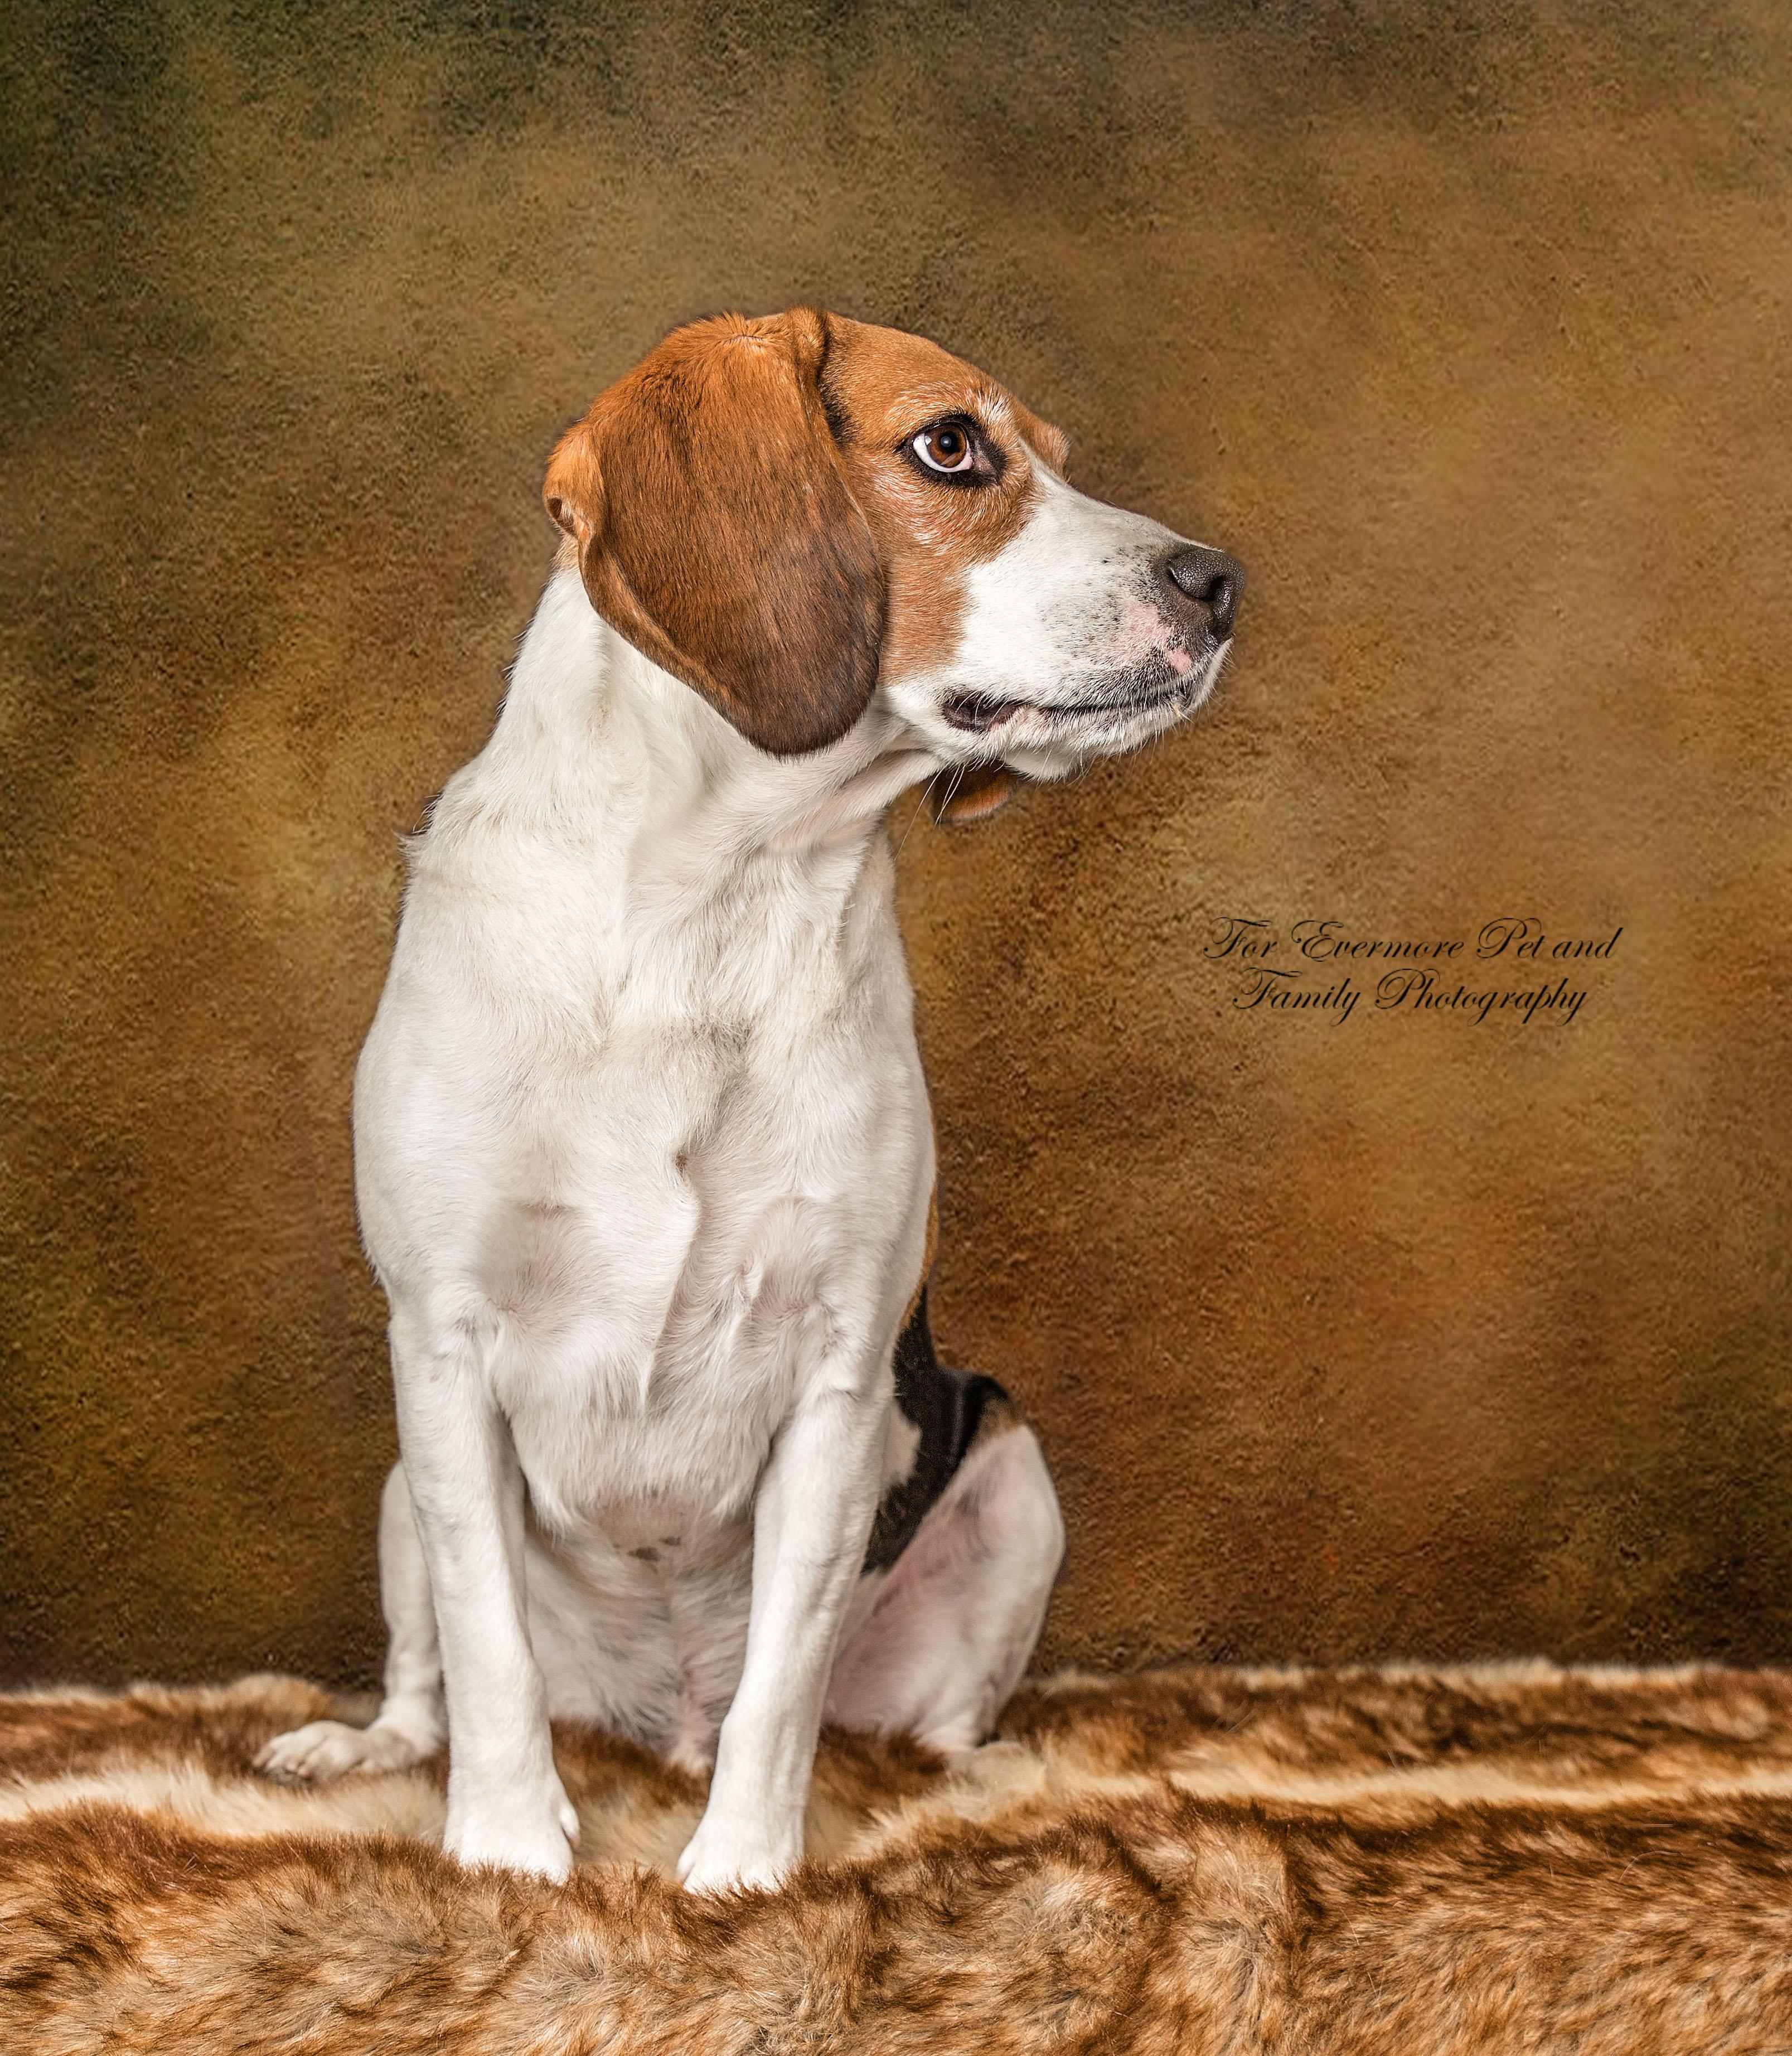 Jake the Beagle